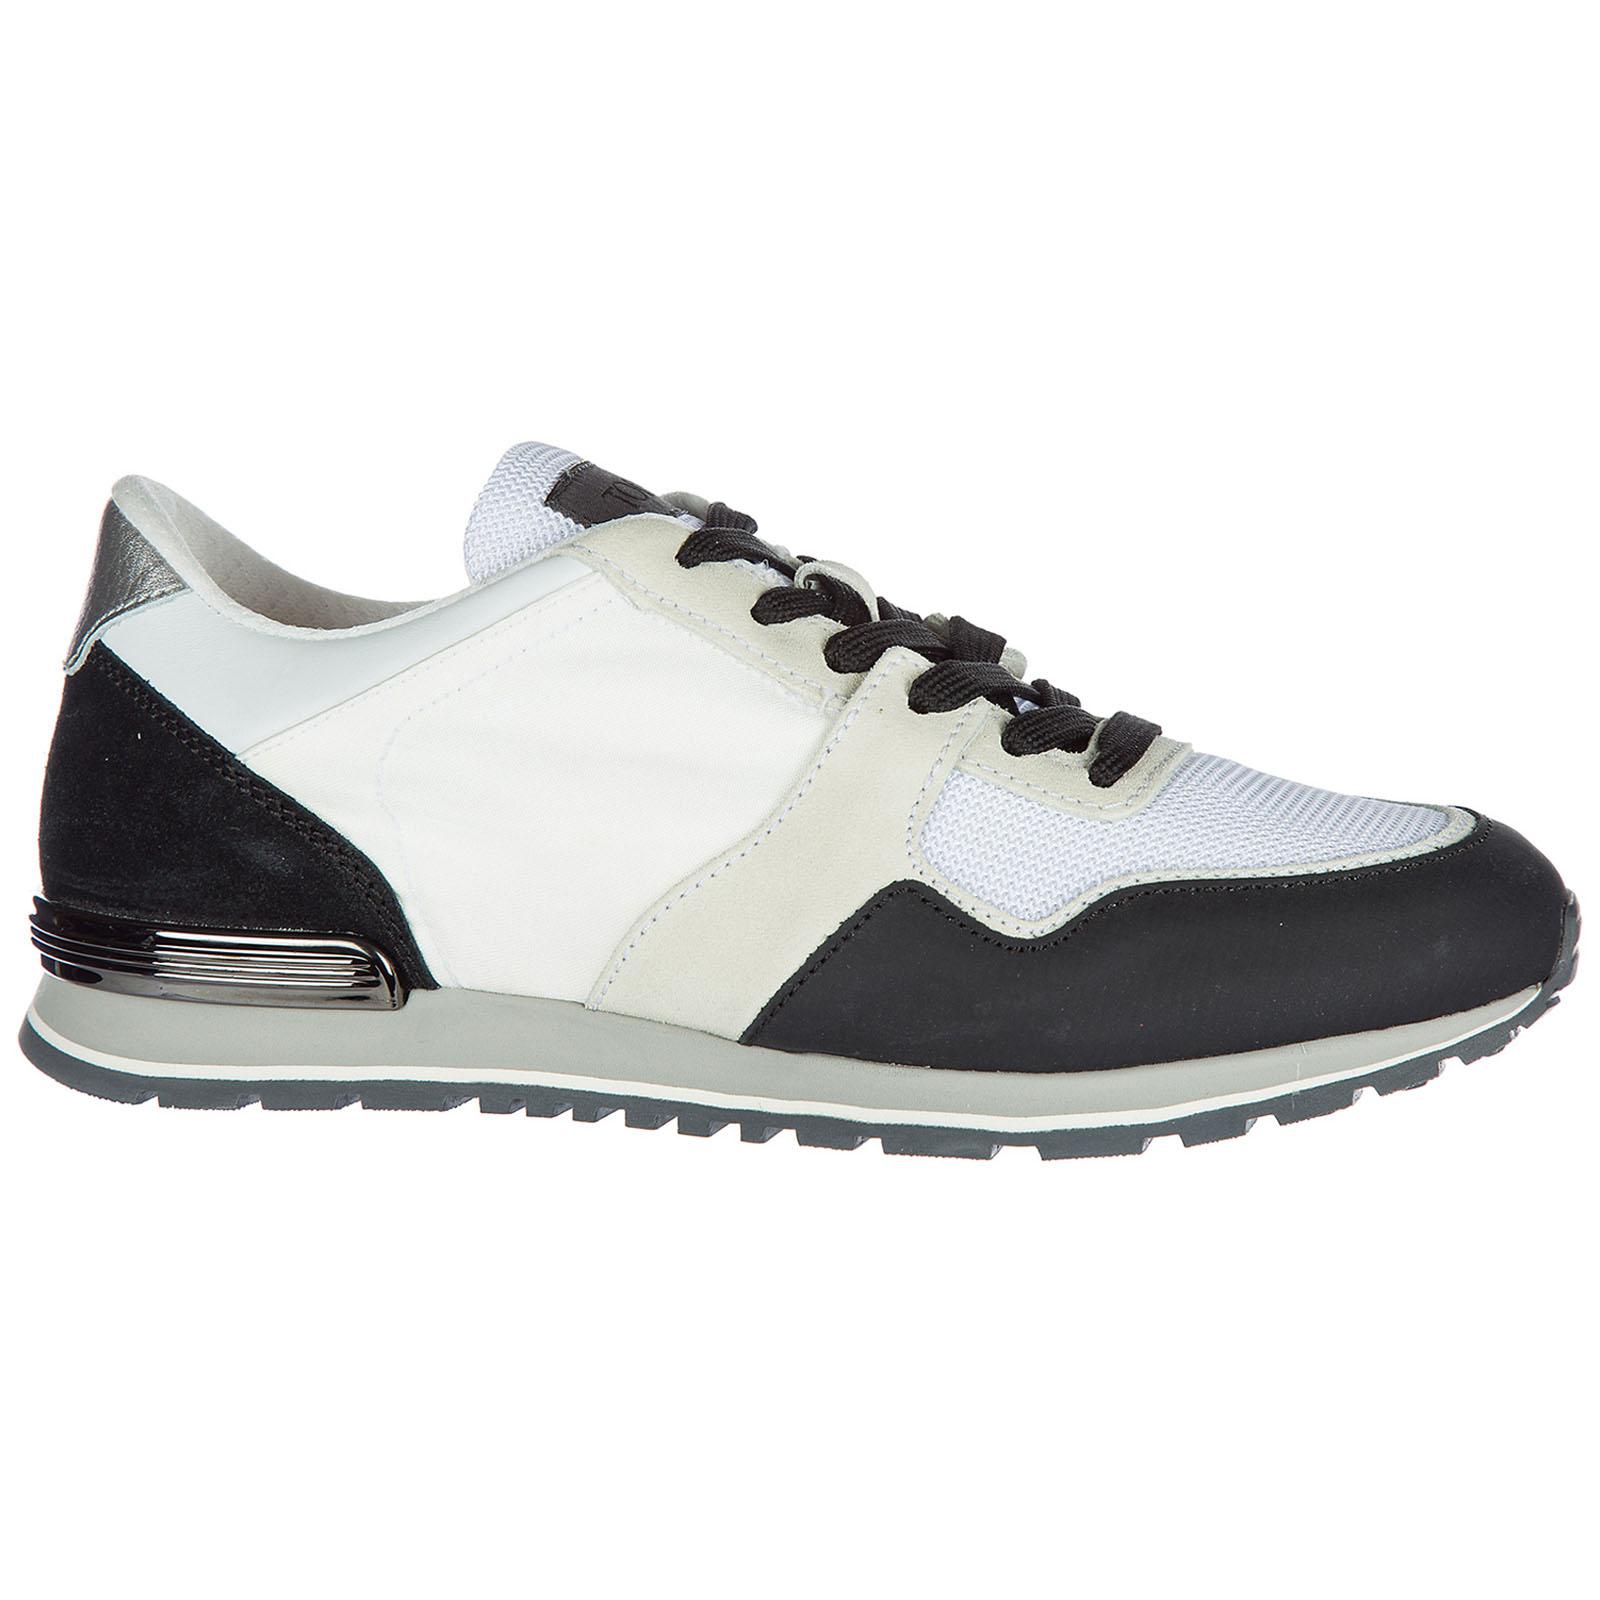 Scarpe sneakers uomo camoscio